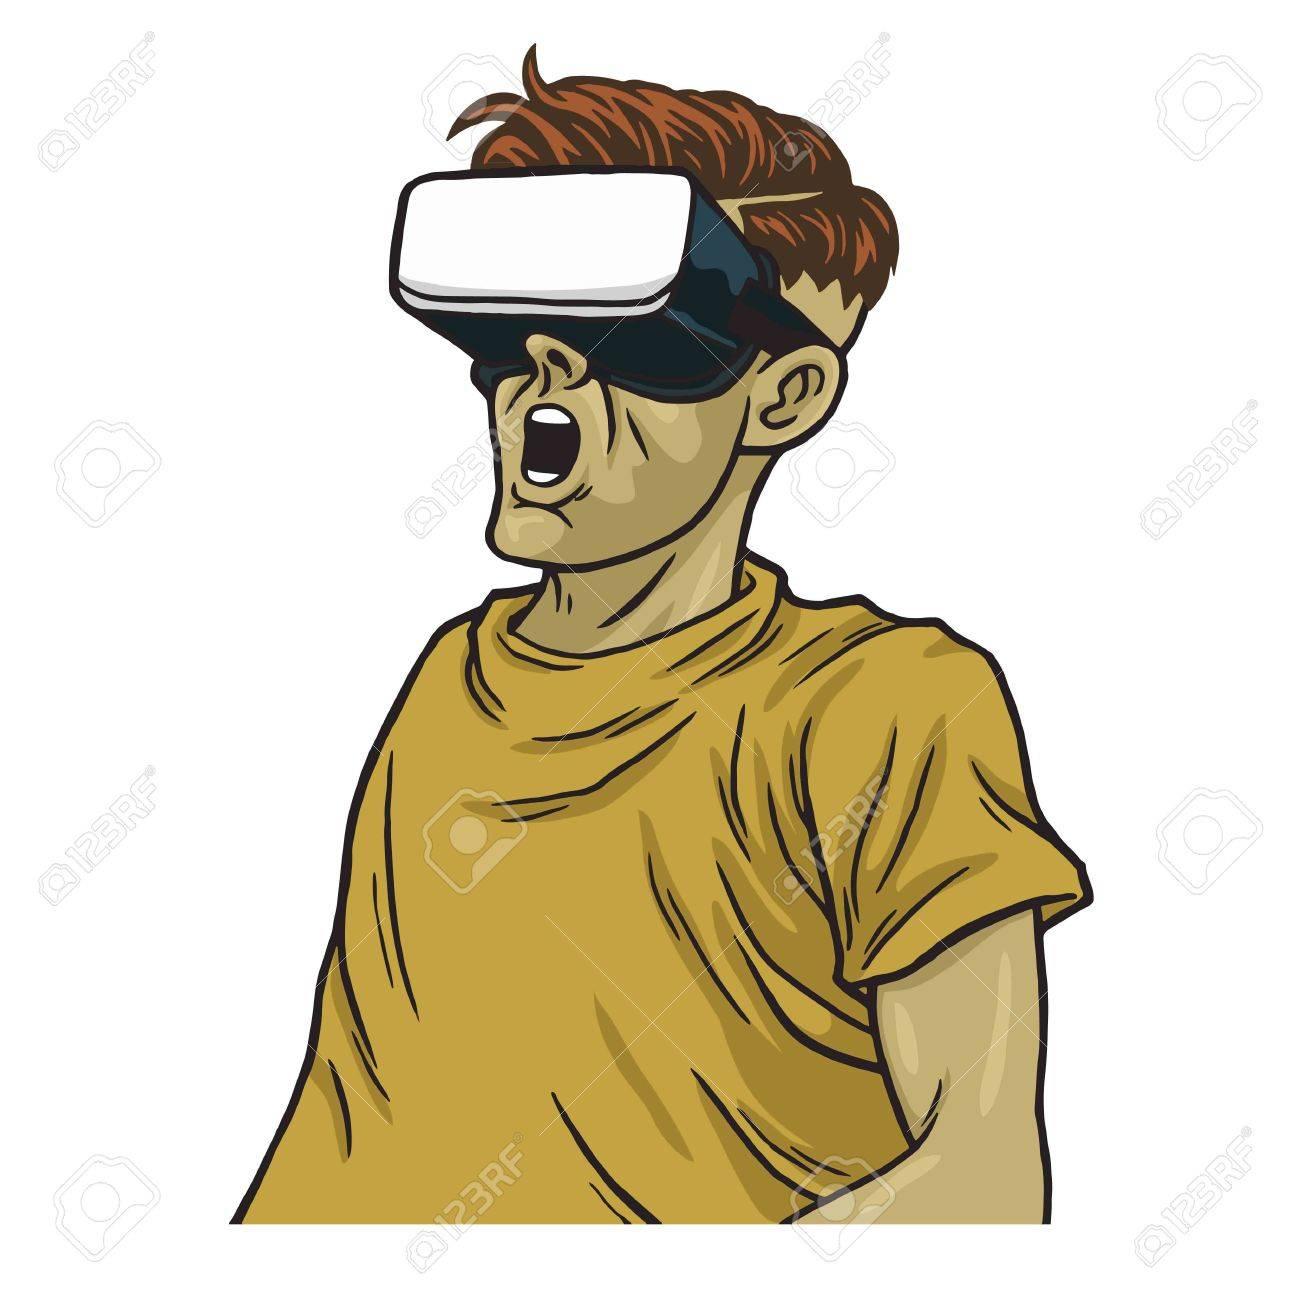 Man Wearing Virtual Reality Goggles Vector Illustration Clipart.